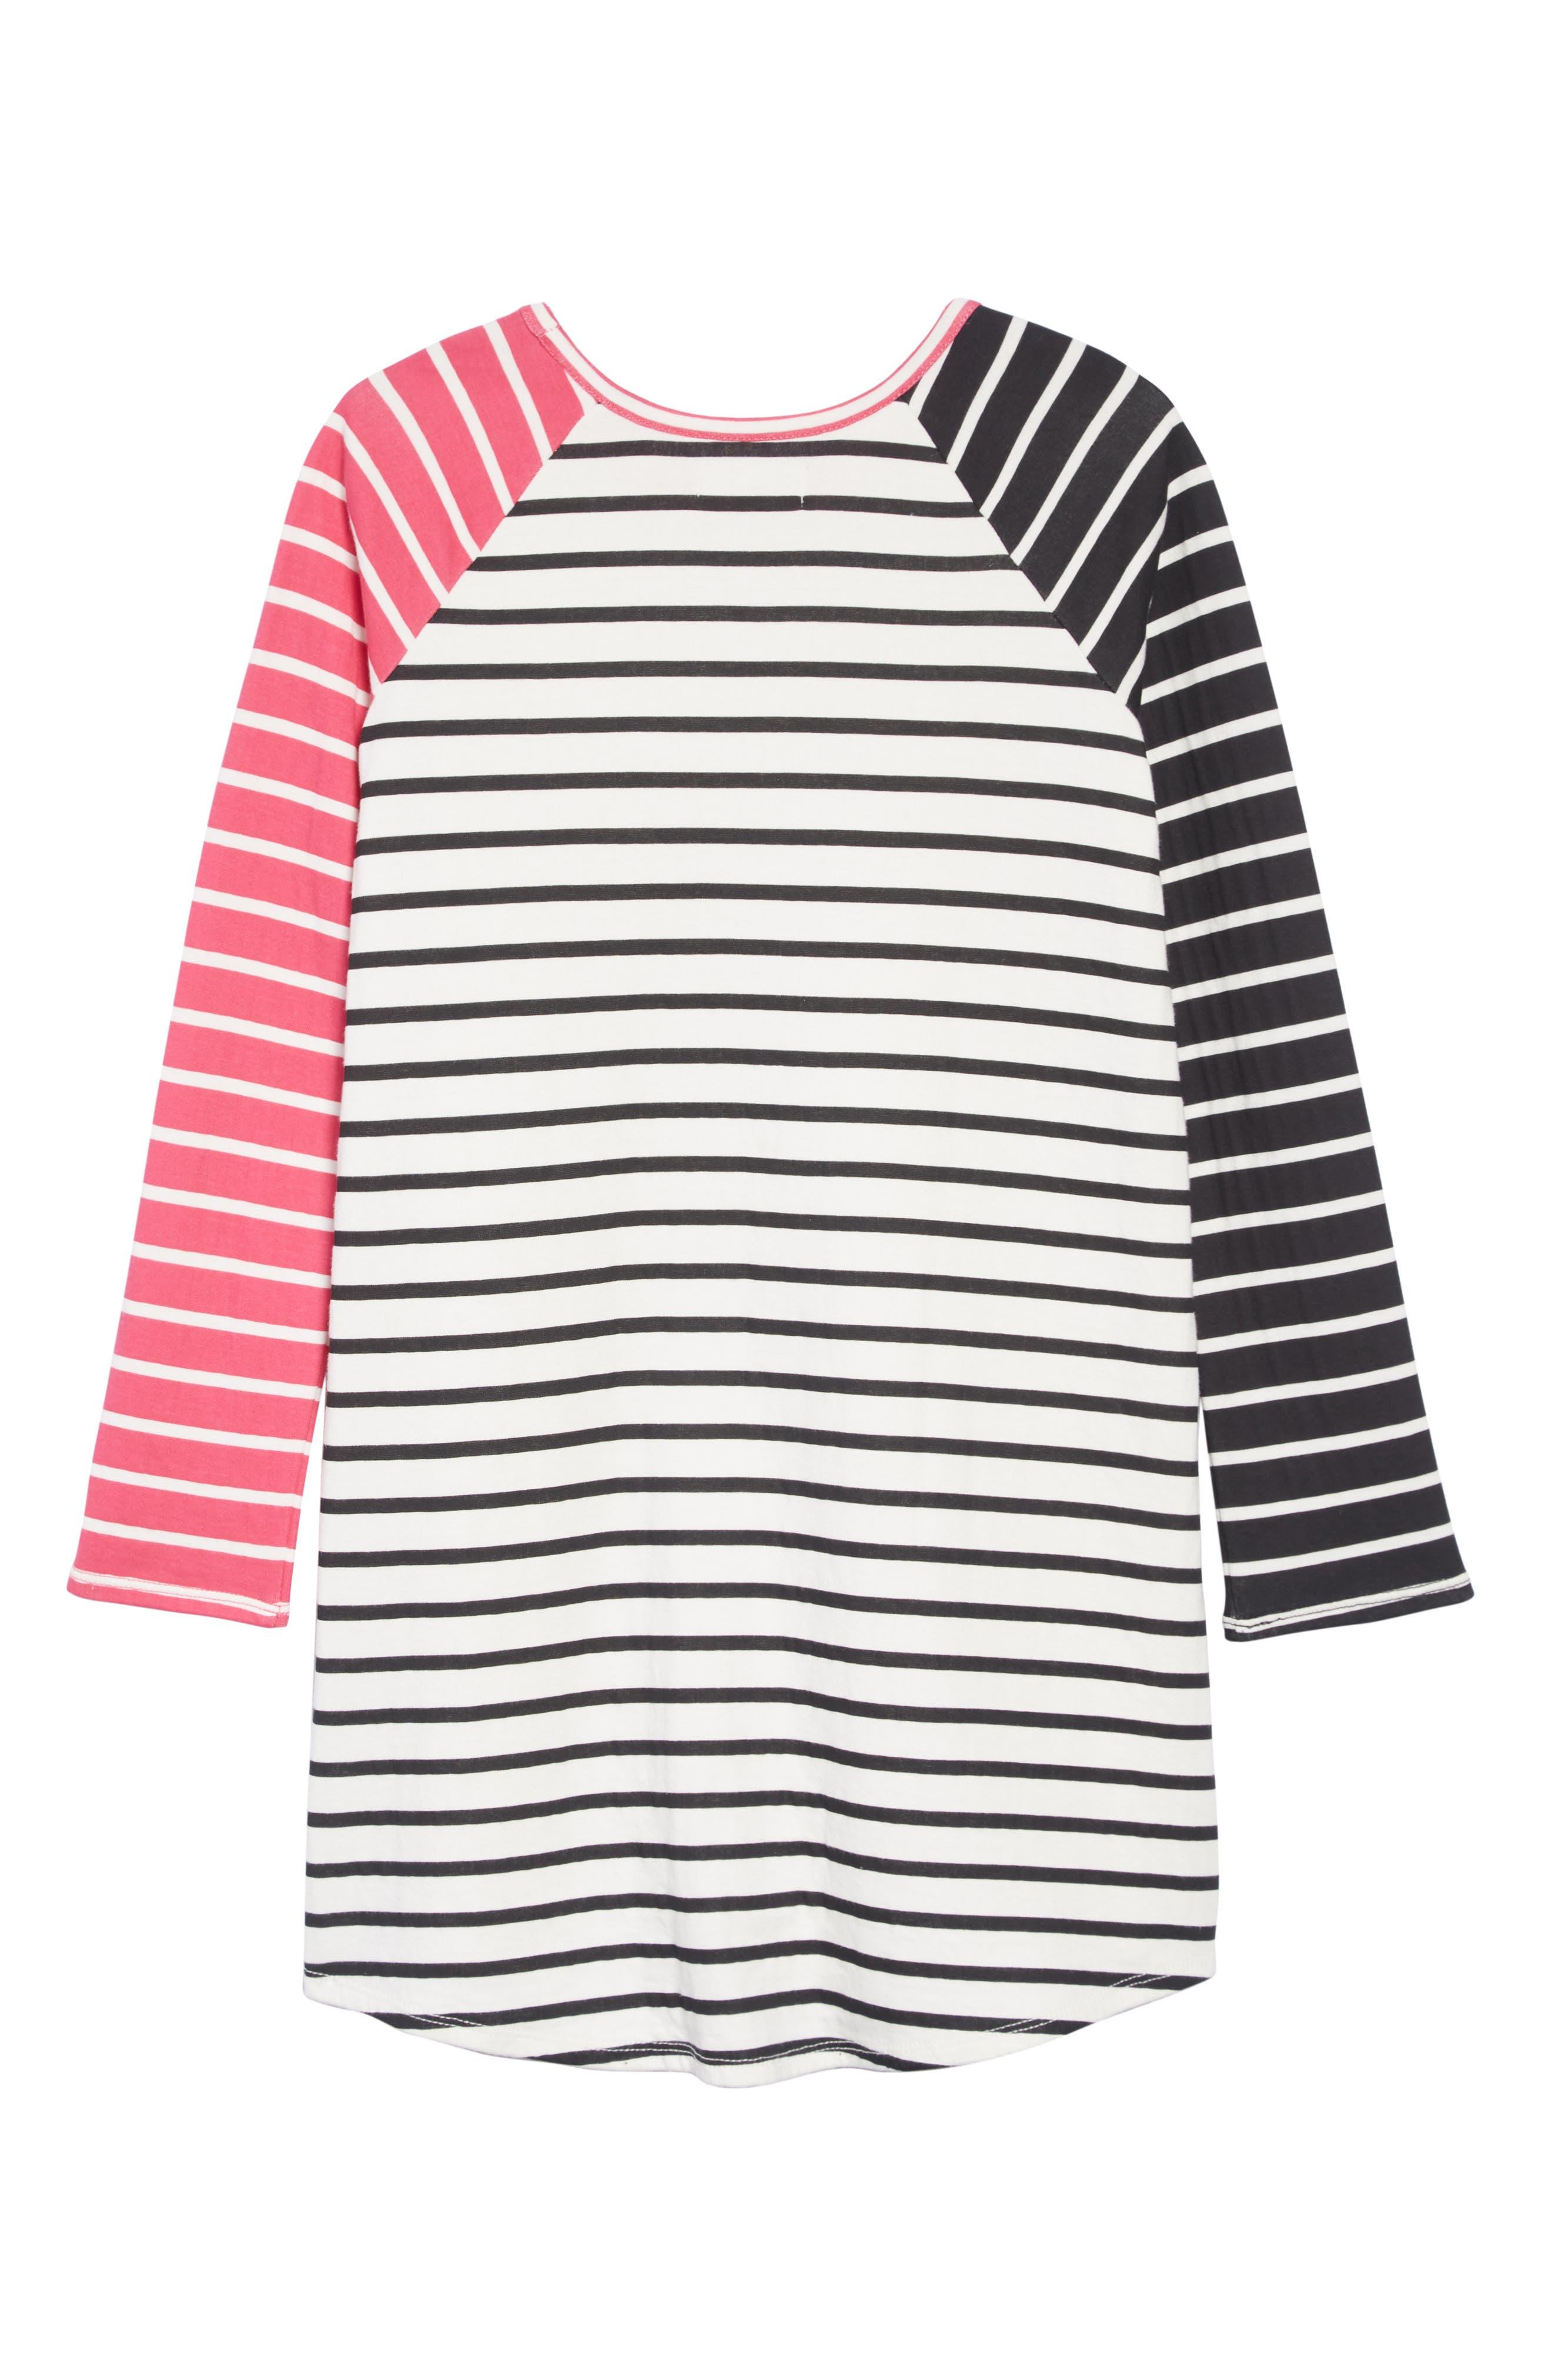 Stripe Dress,                             Alternate thumbnail 2, color,                             IVORY EGRET MULTI STRIPE